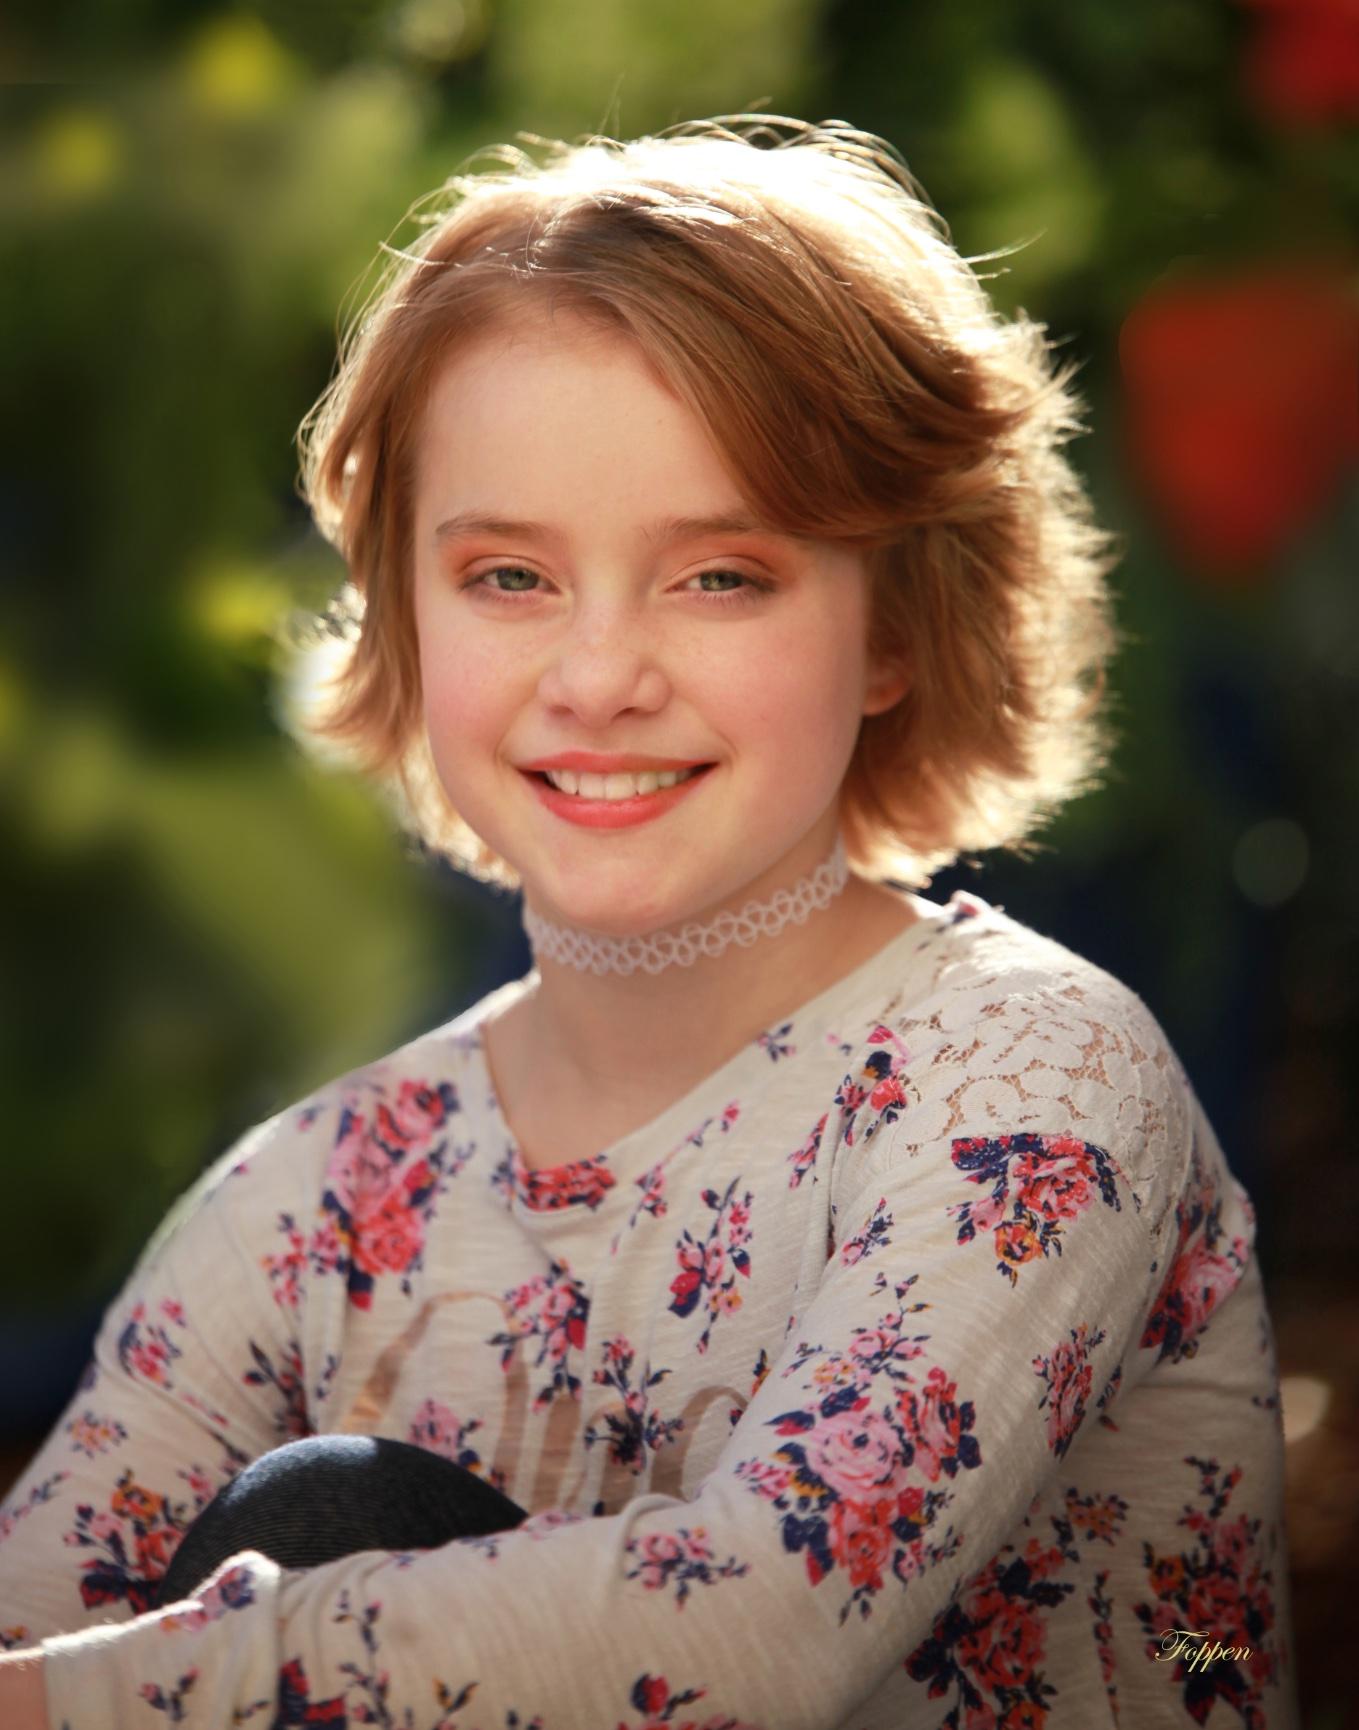 Hannah jOnes, denison